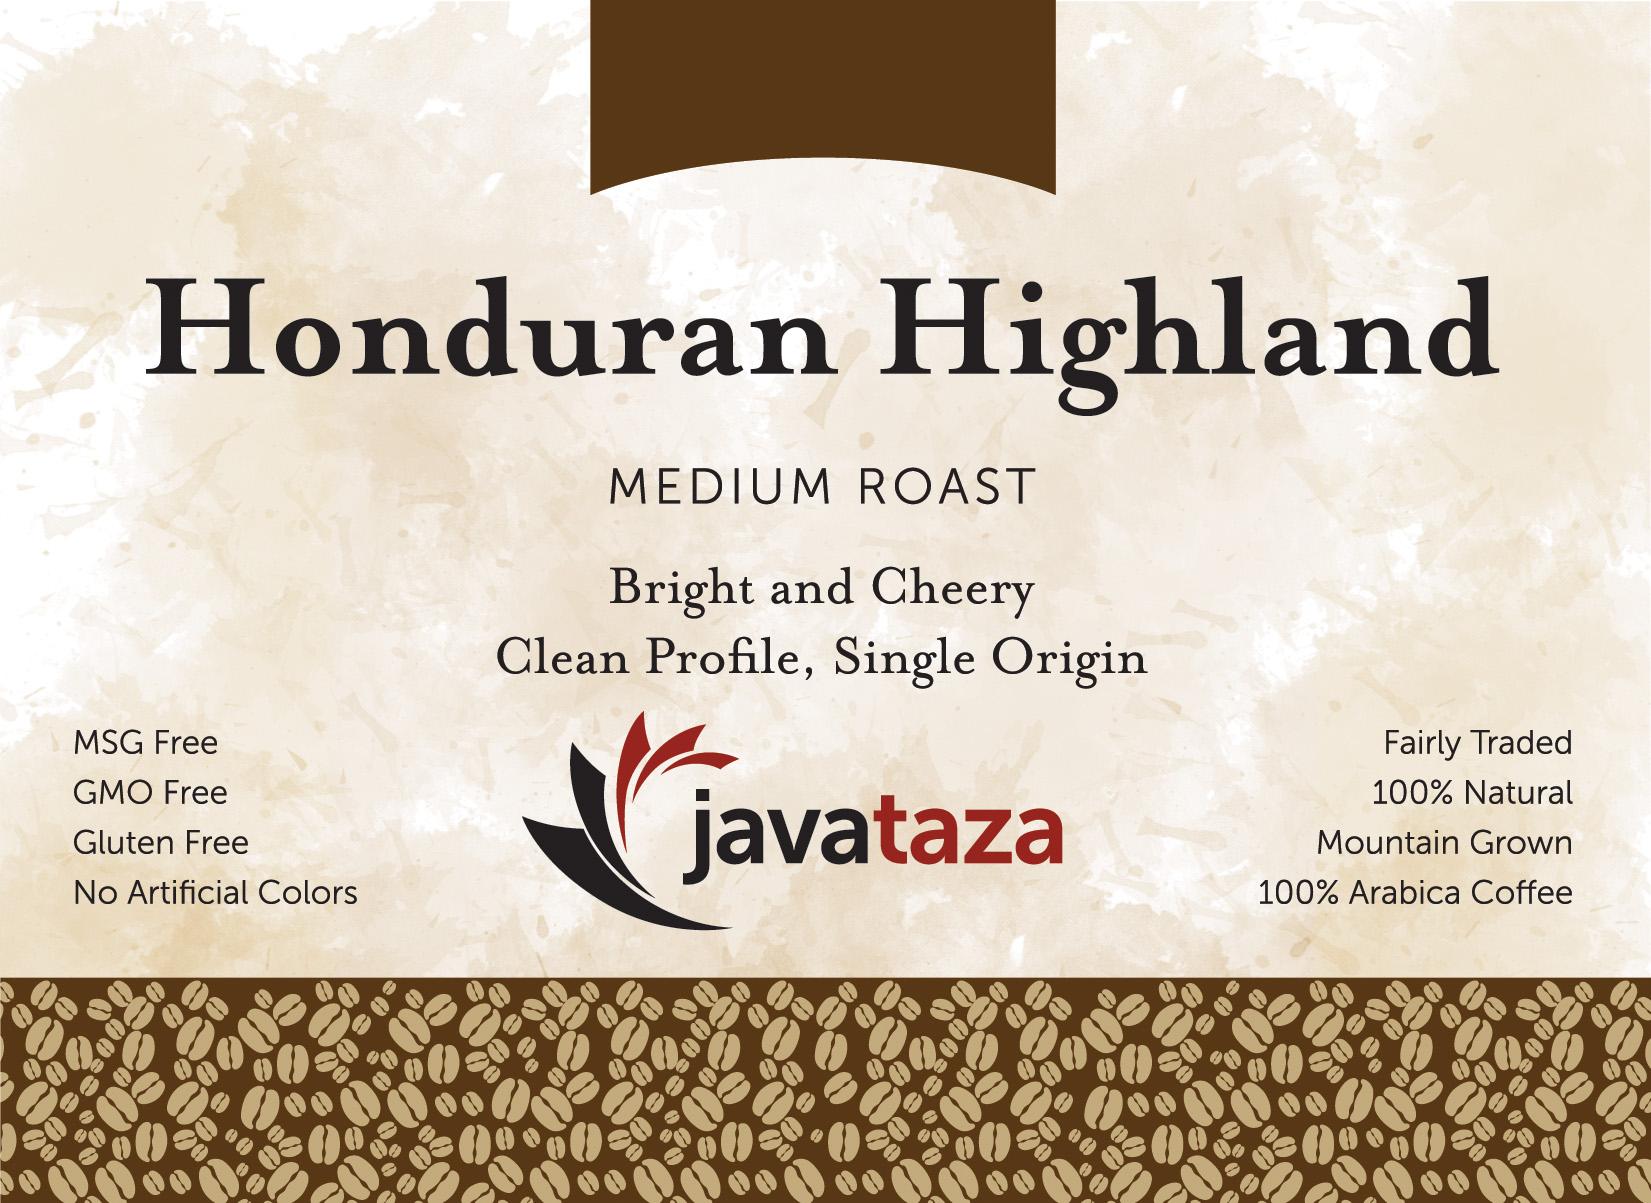 honduran highland ground direct trade coffee